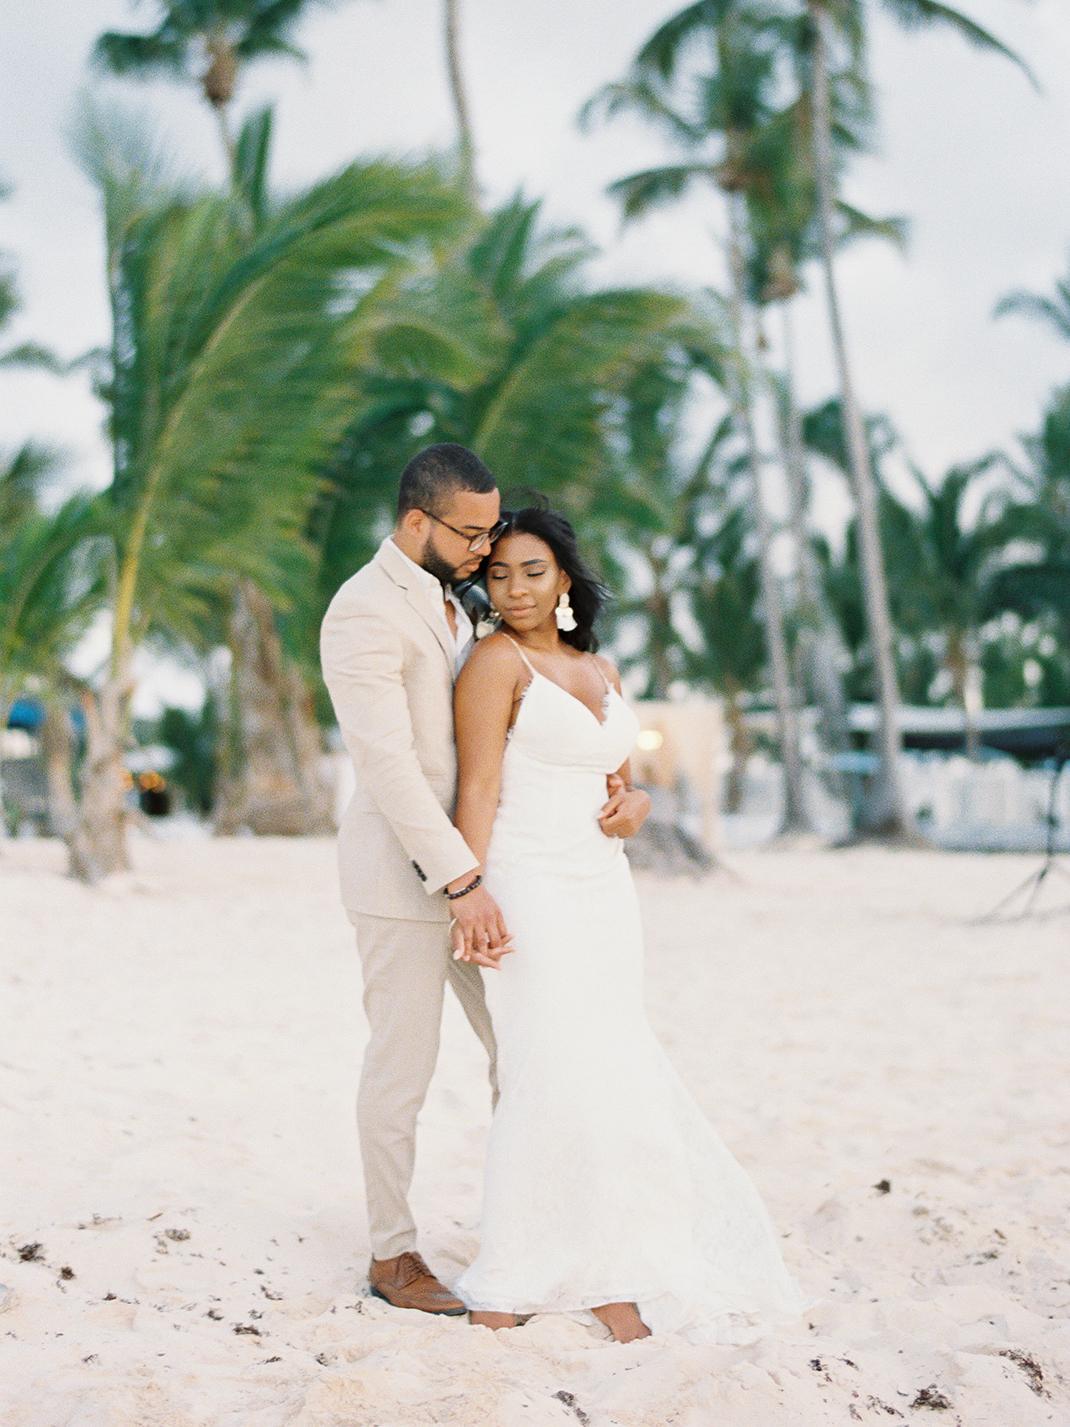 black couple bride and groom on beach